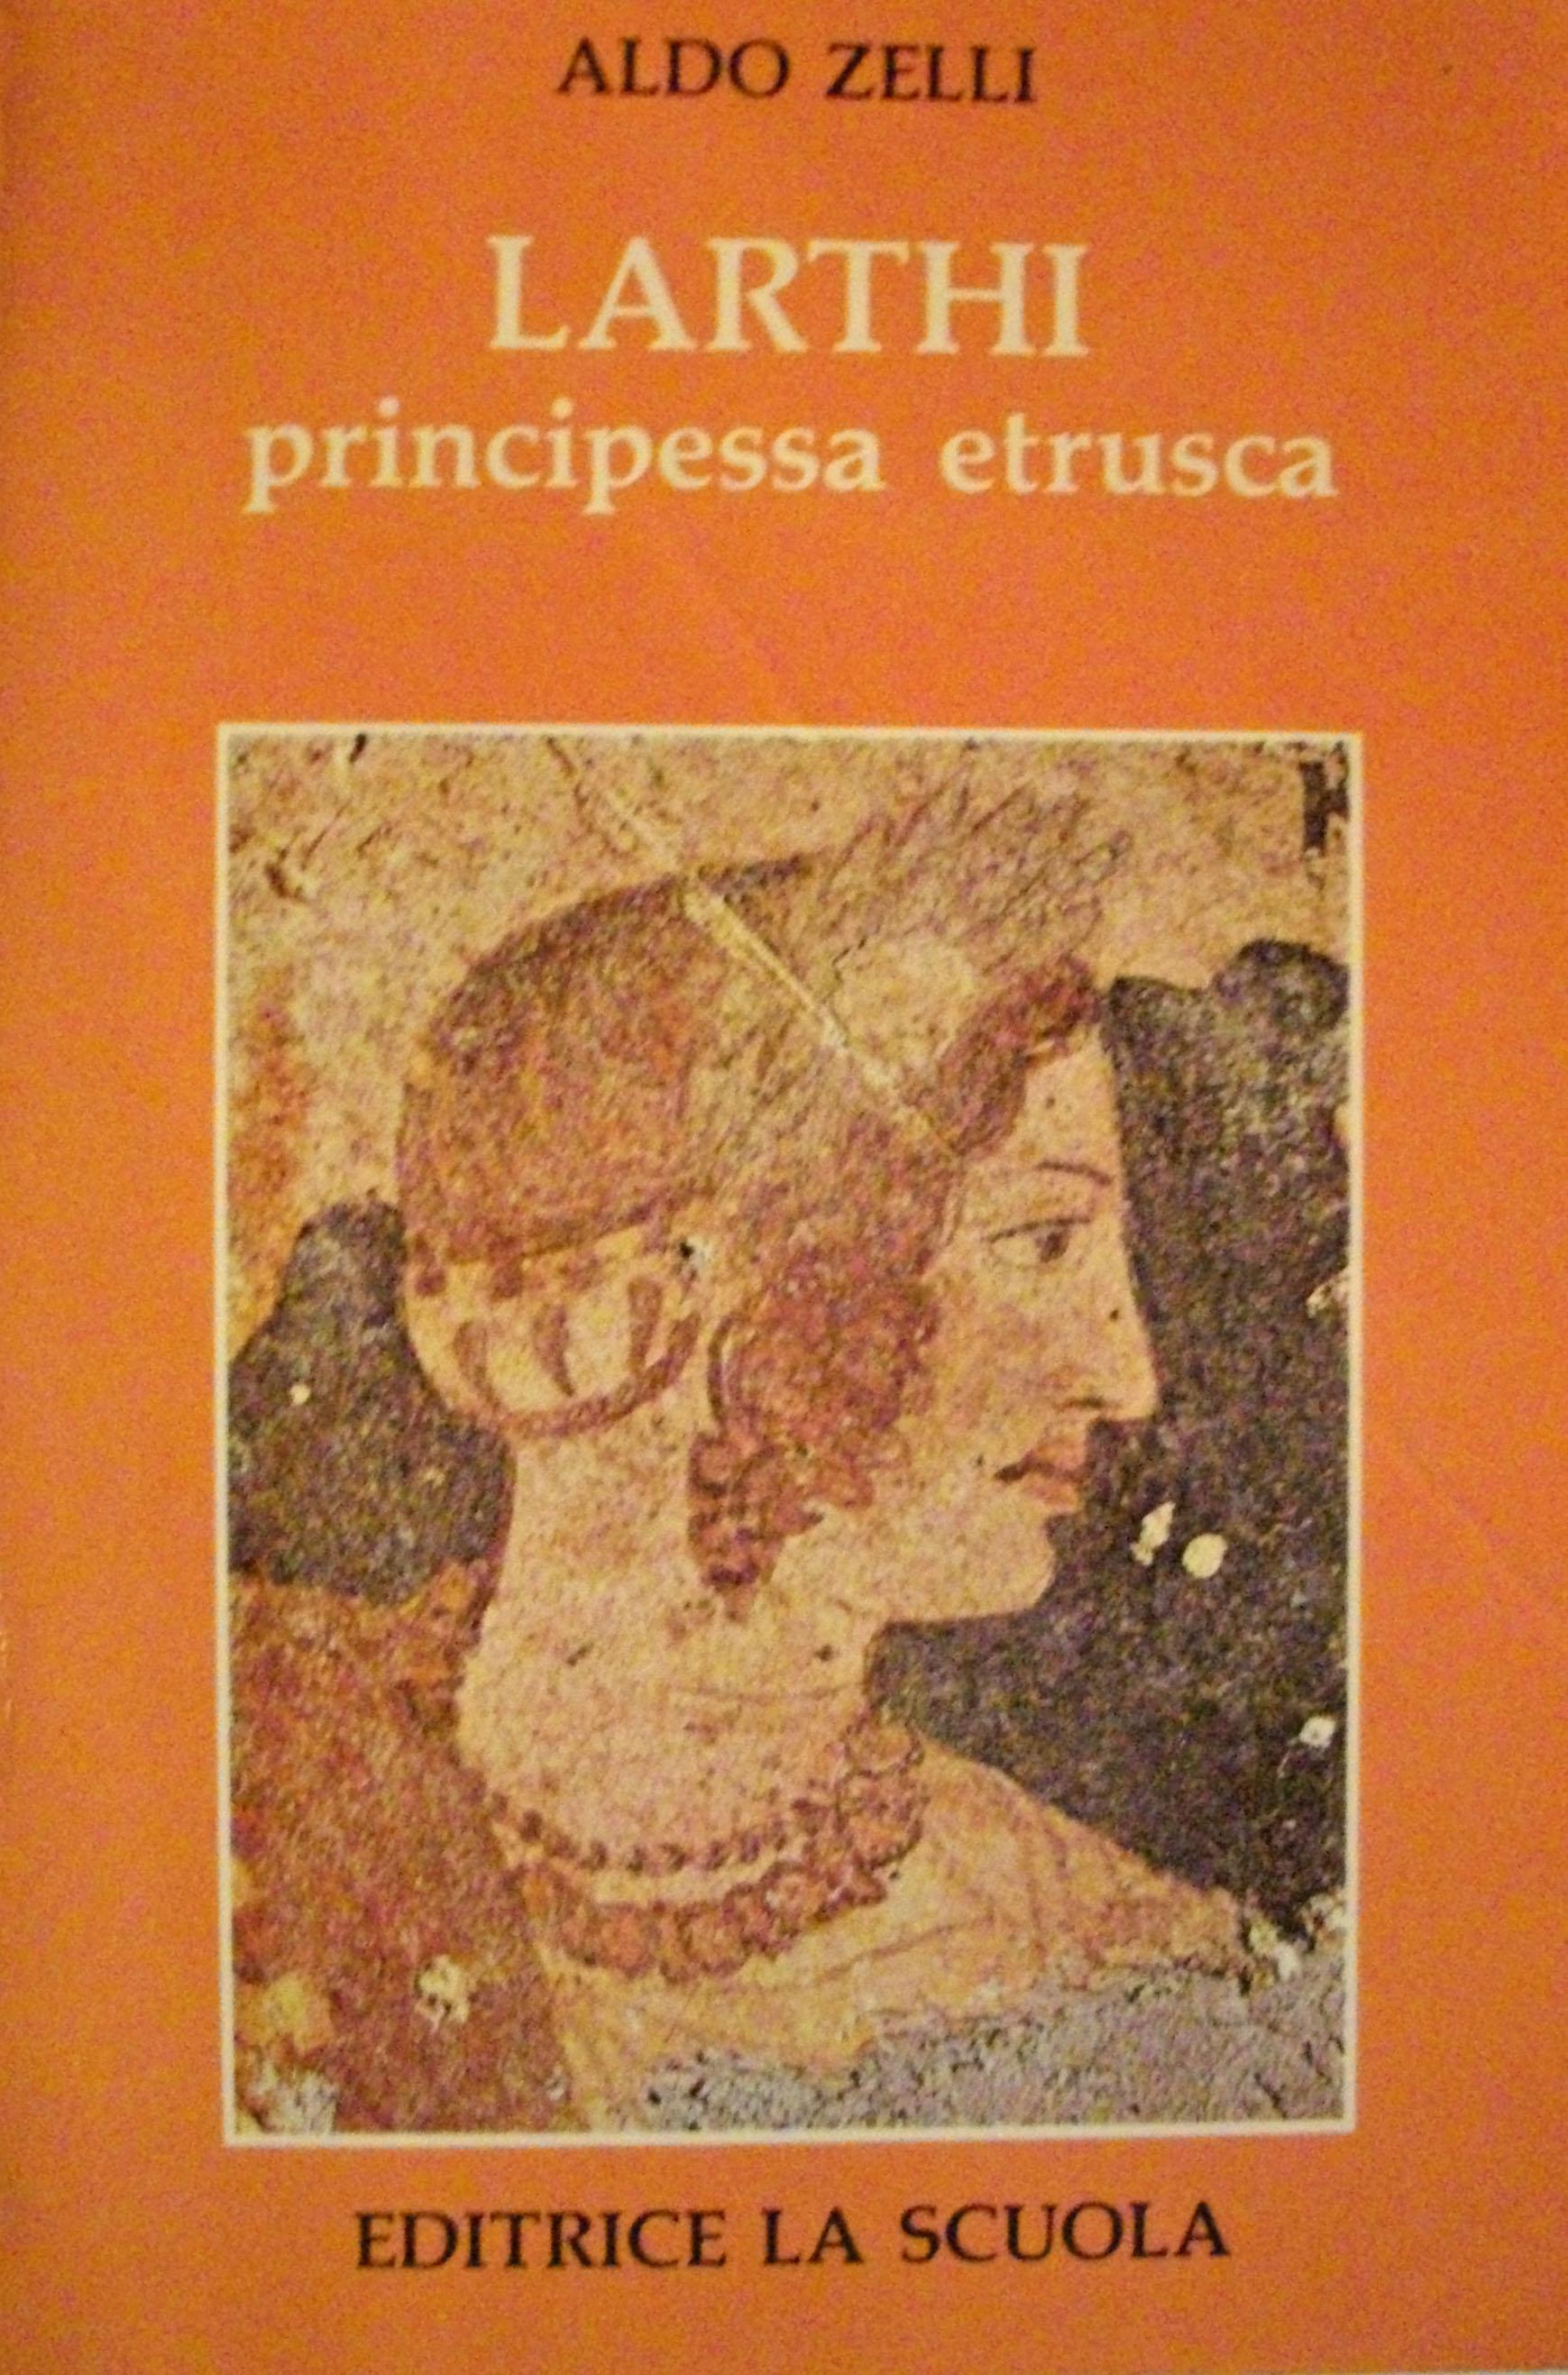 Larthi principesca etrusca